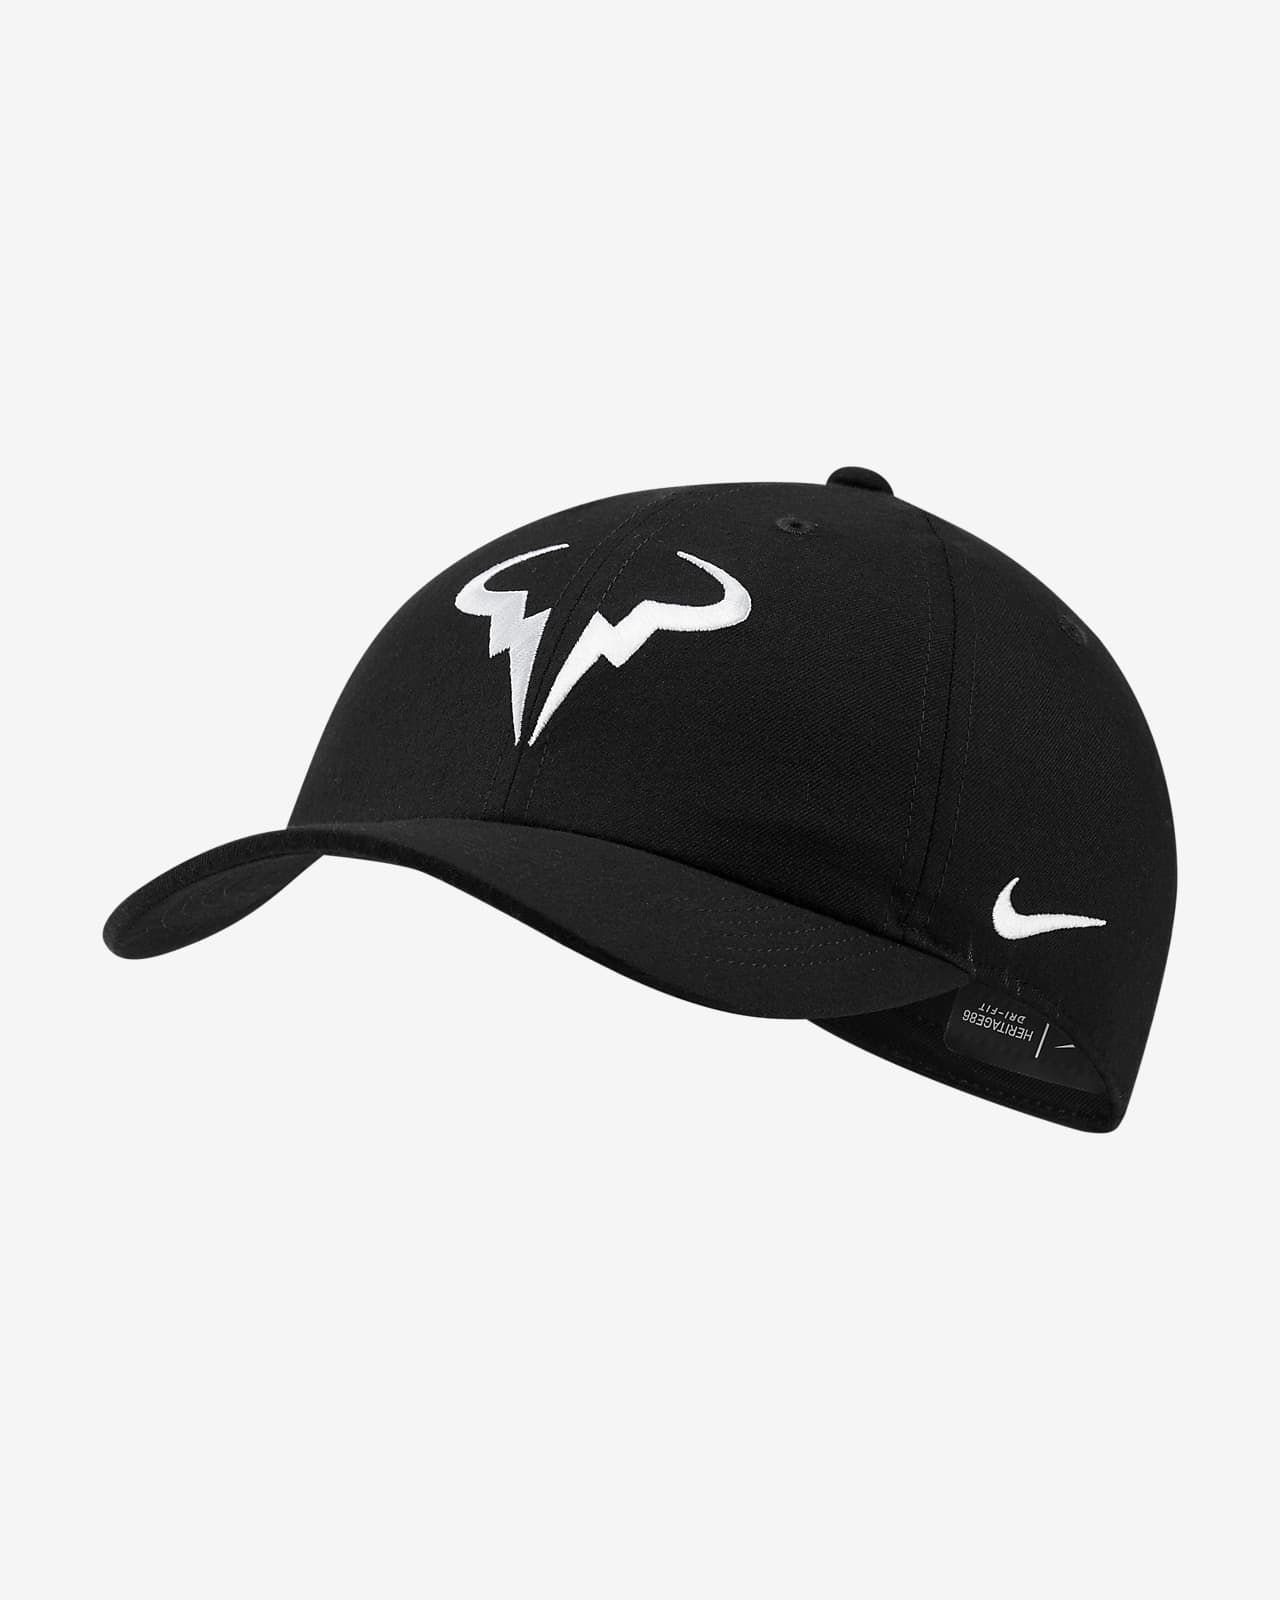 NikeCourt AeroBill Rafa Heritage86 tenniscaps